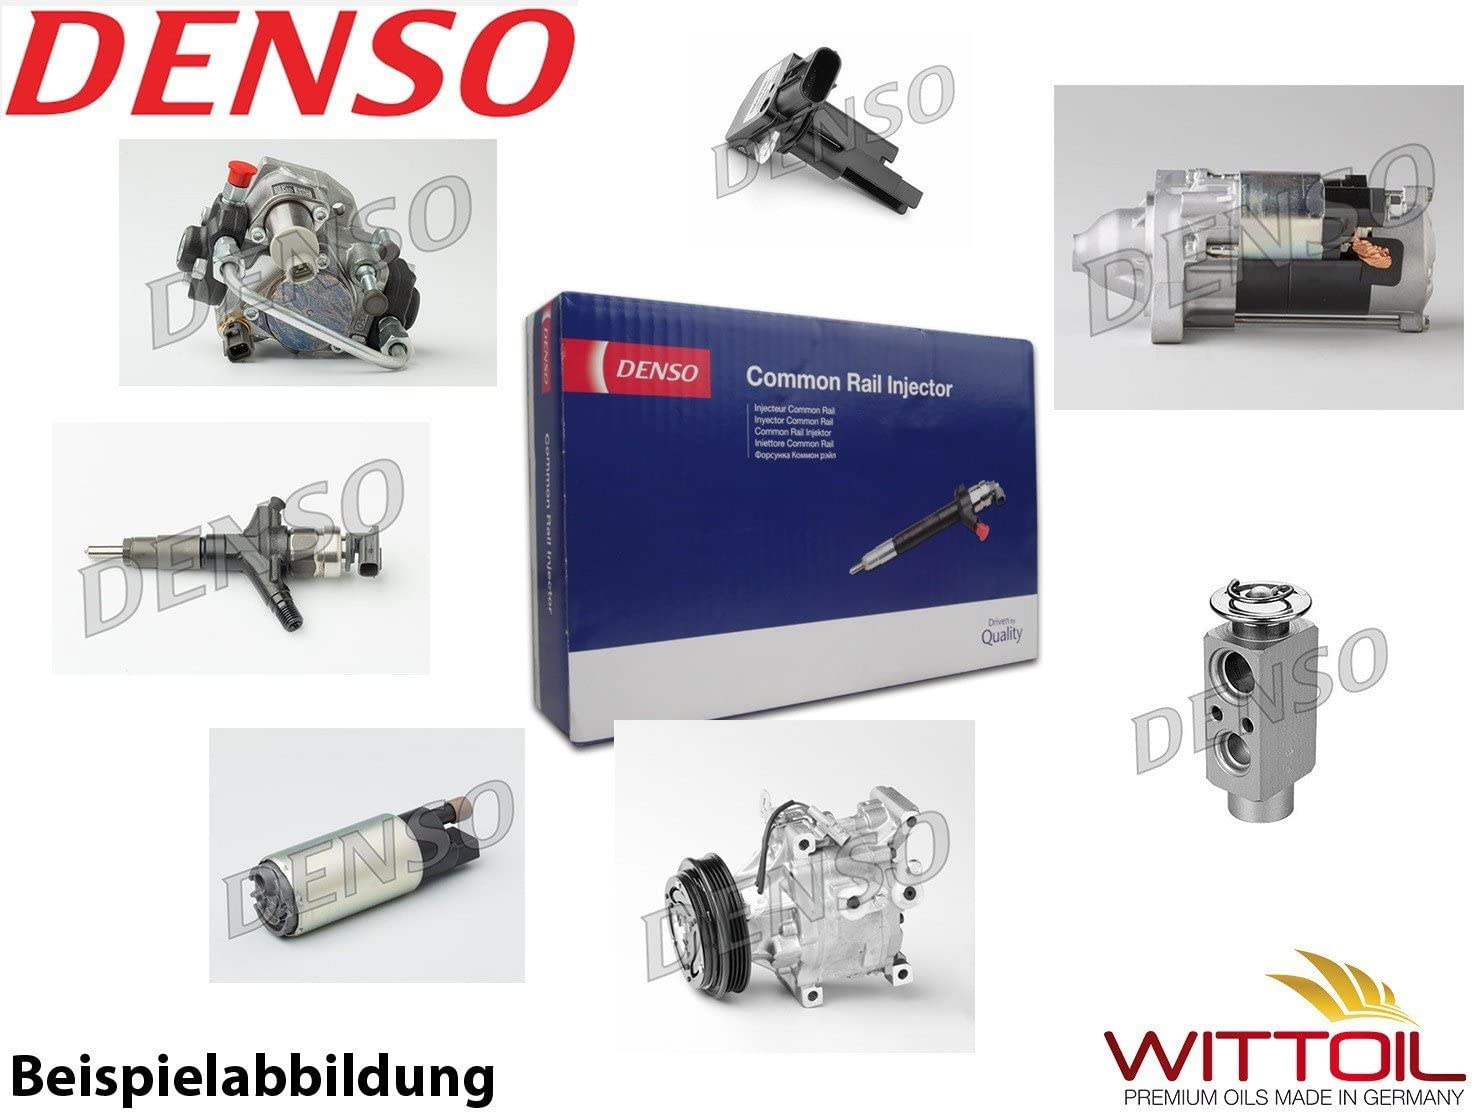 Denso Dcrs300250 Druckregelventil Common Rail System Auto